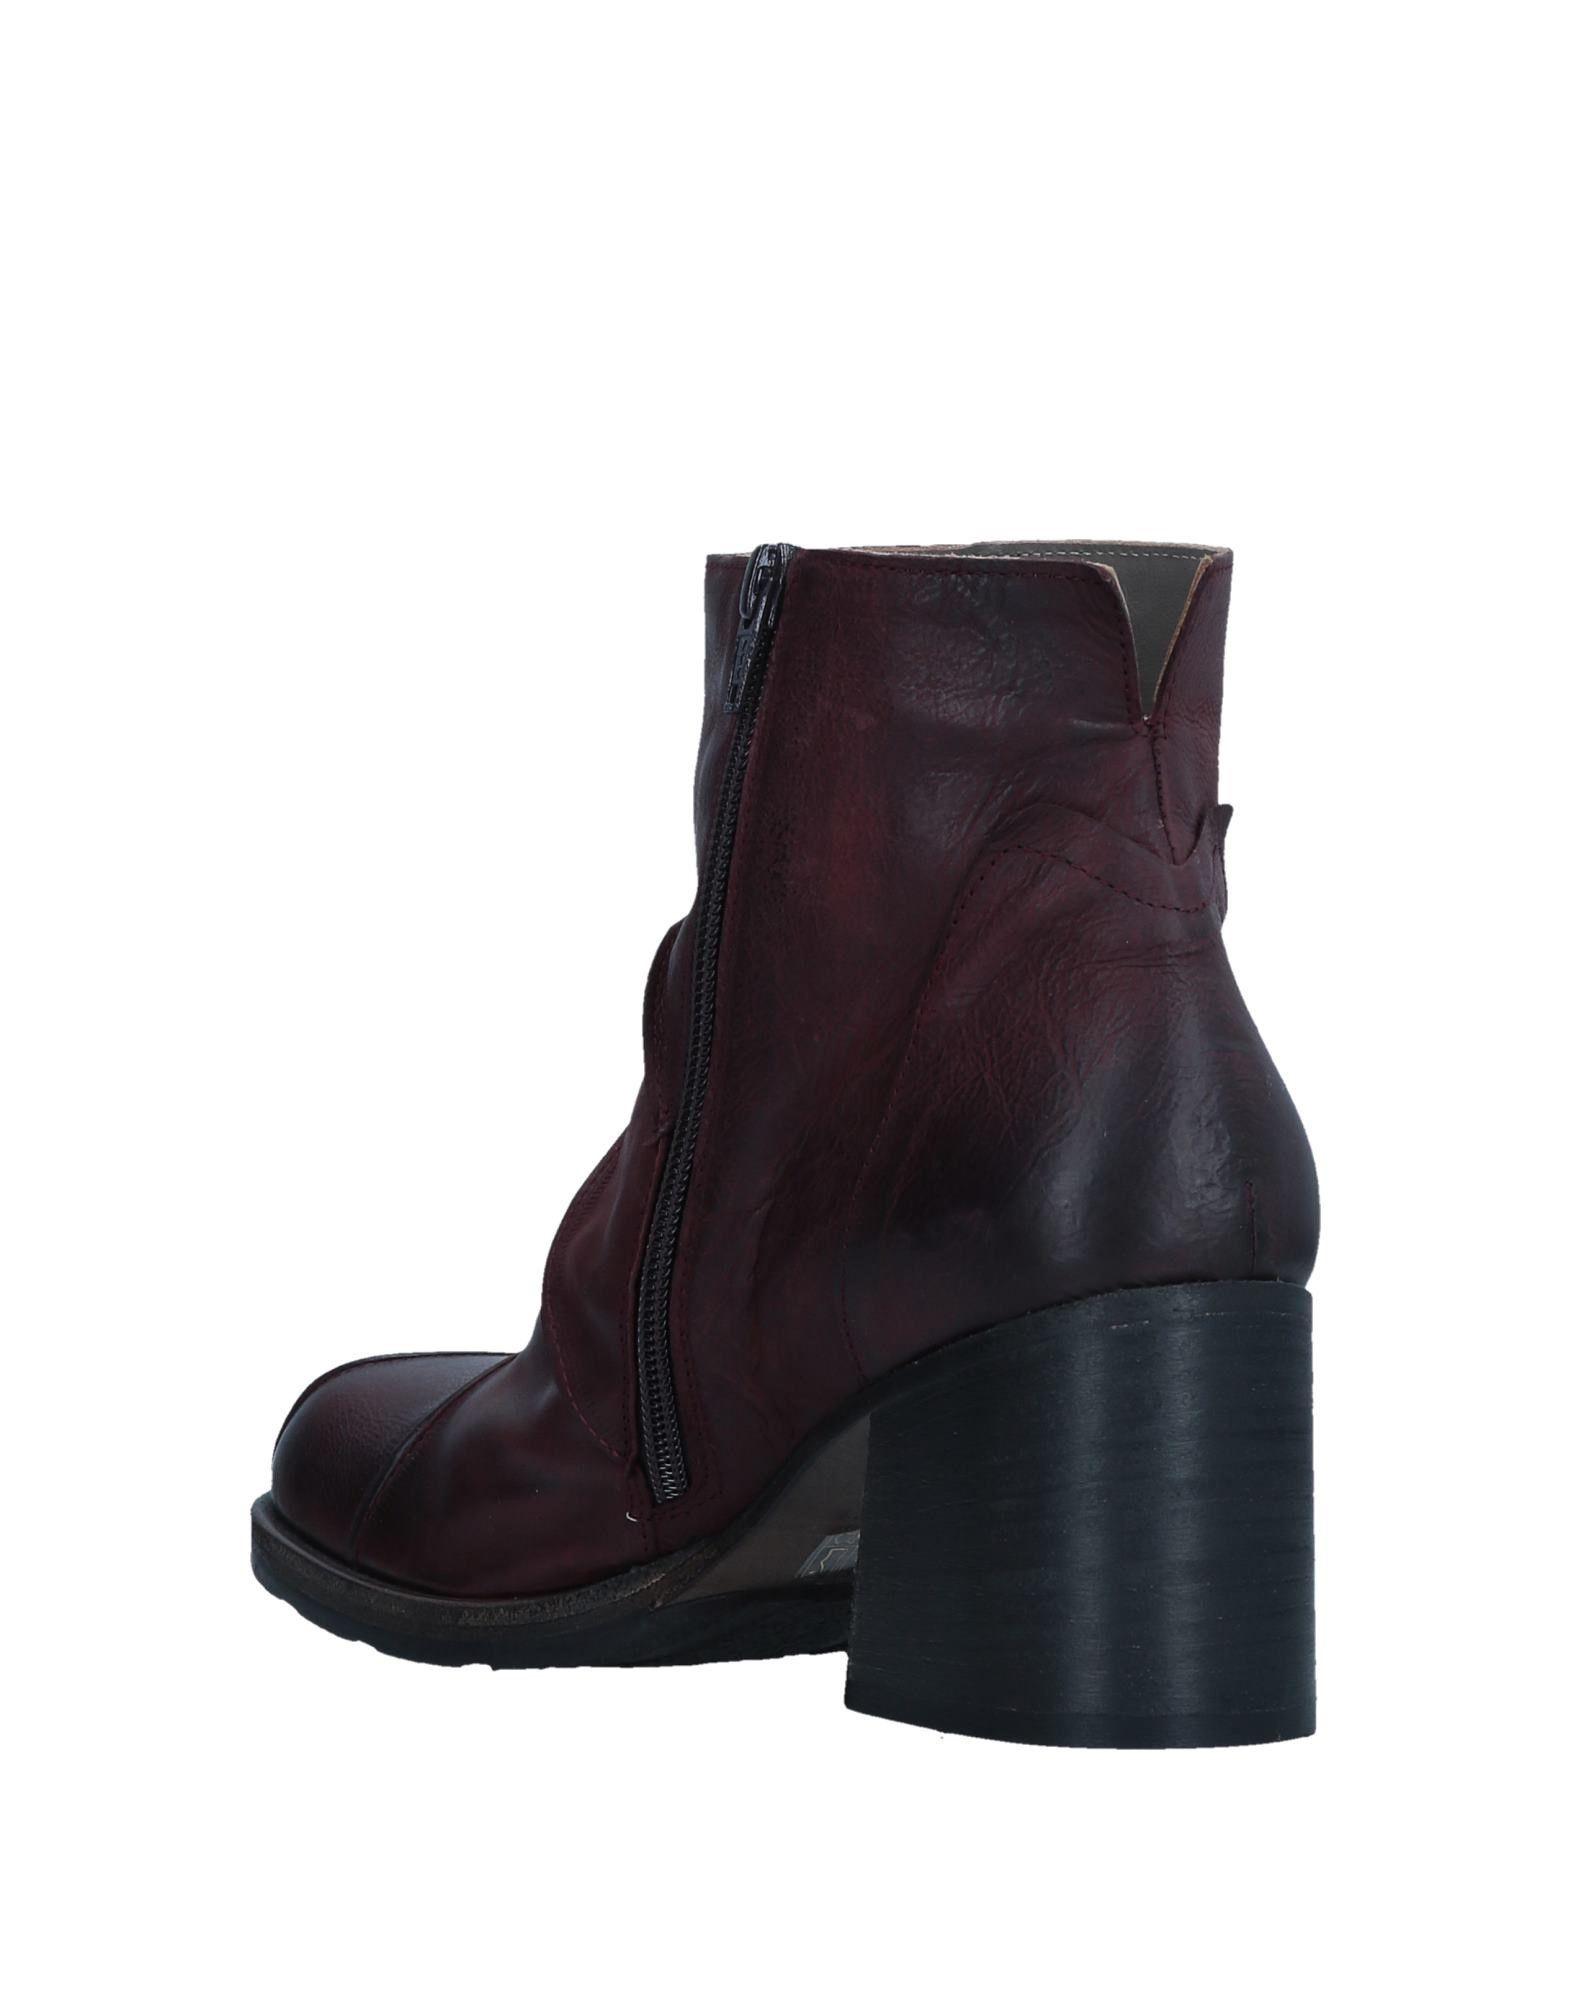 Rabatt Schuhe Ixos Stiefelette  Damen  Stiefelette 11527518SH 4ea906